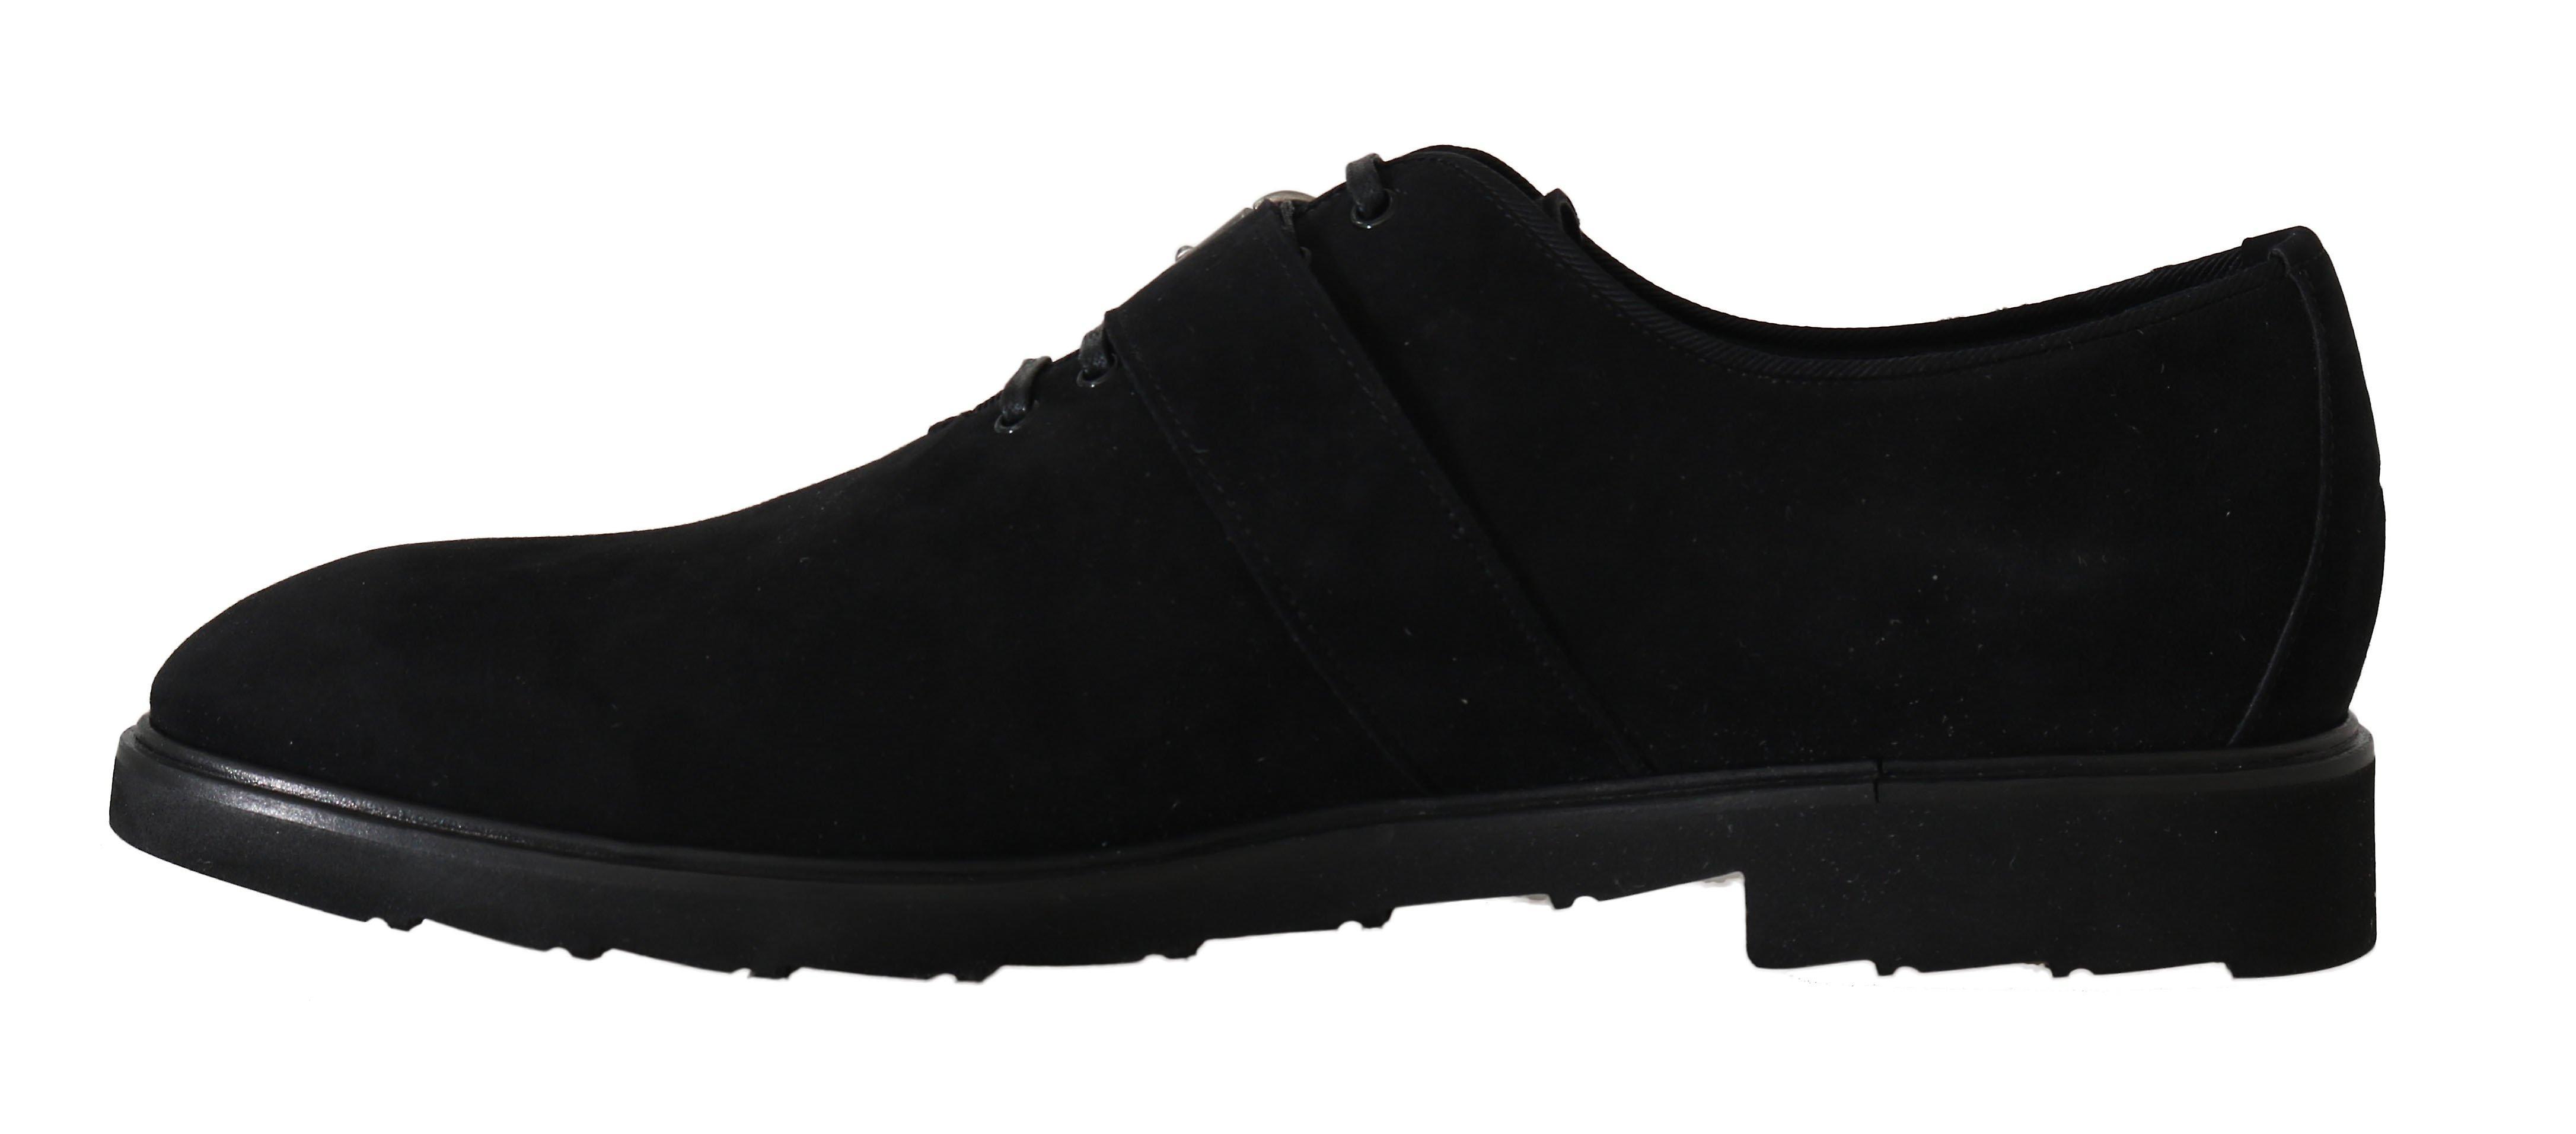 Dolce & Gabbana Black Suede Monkstrap Sukienka Formalne Buty -- Mv20901552